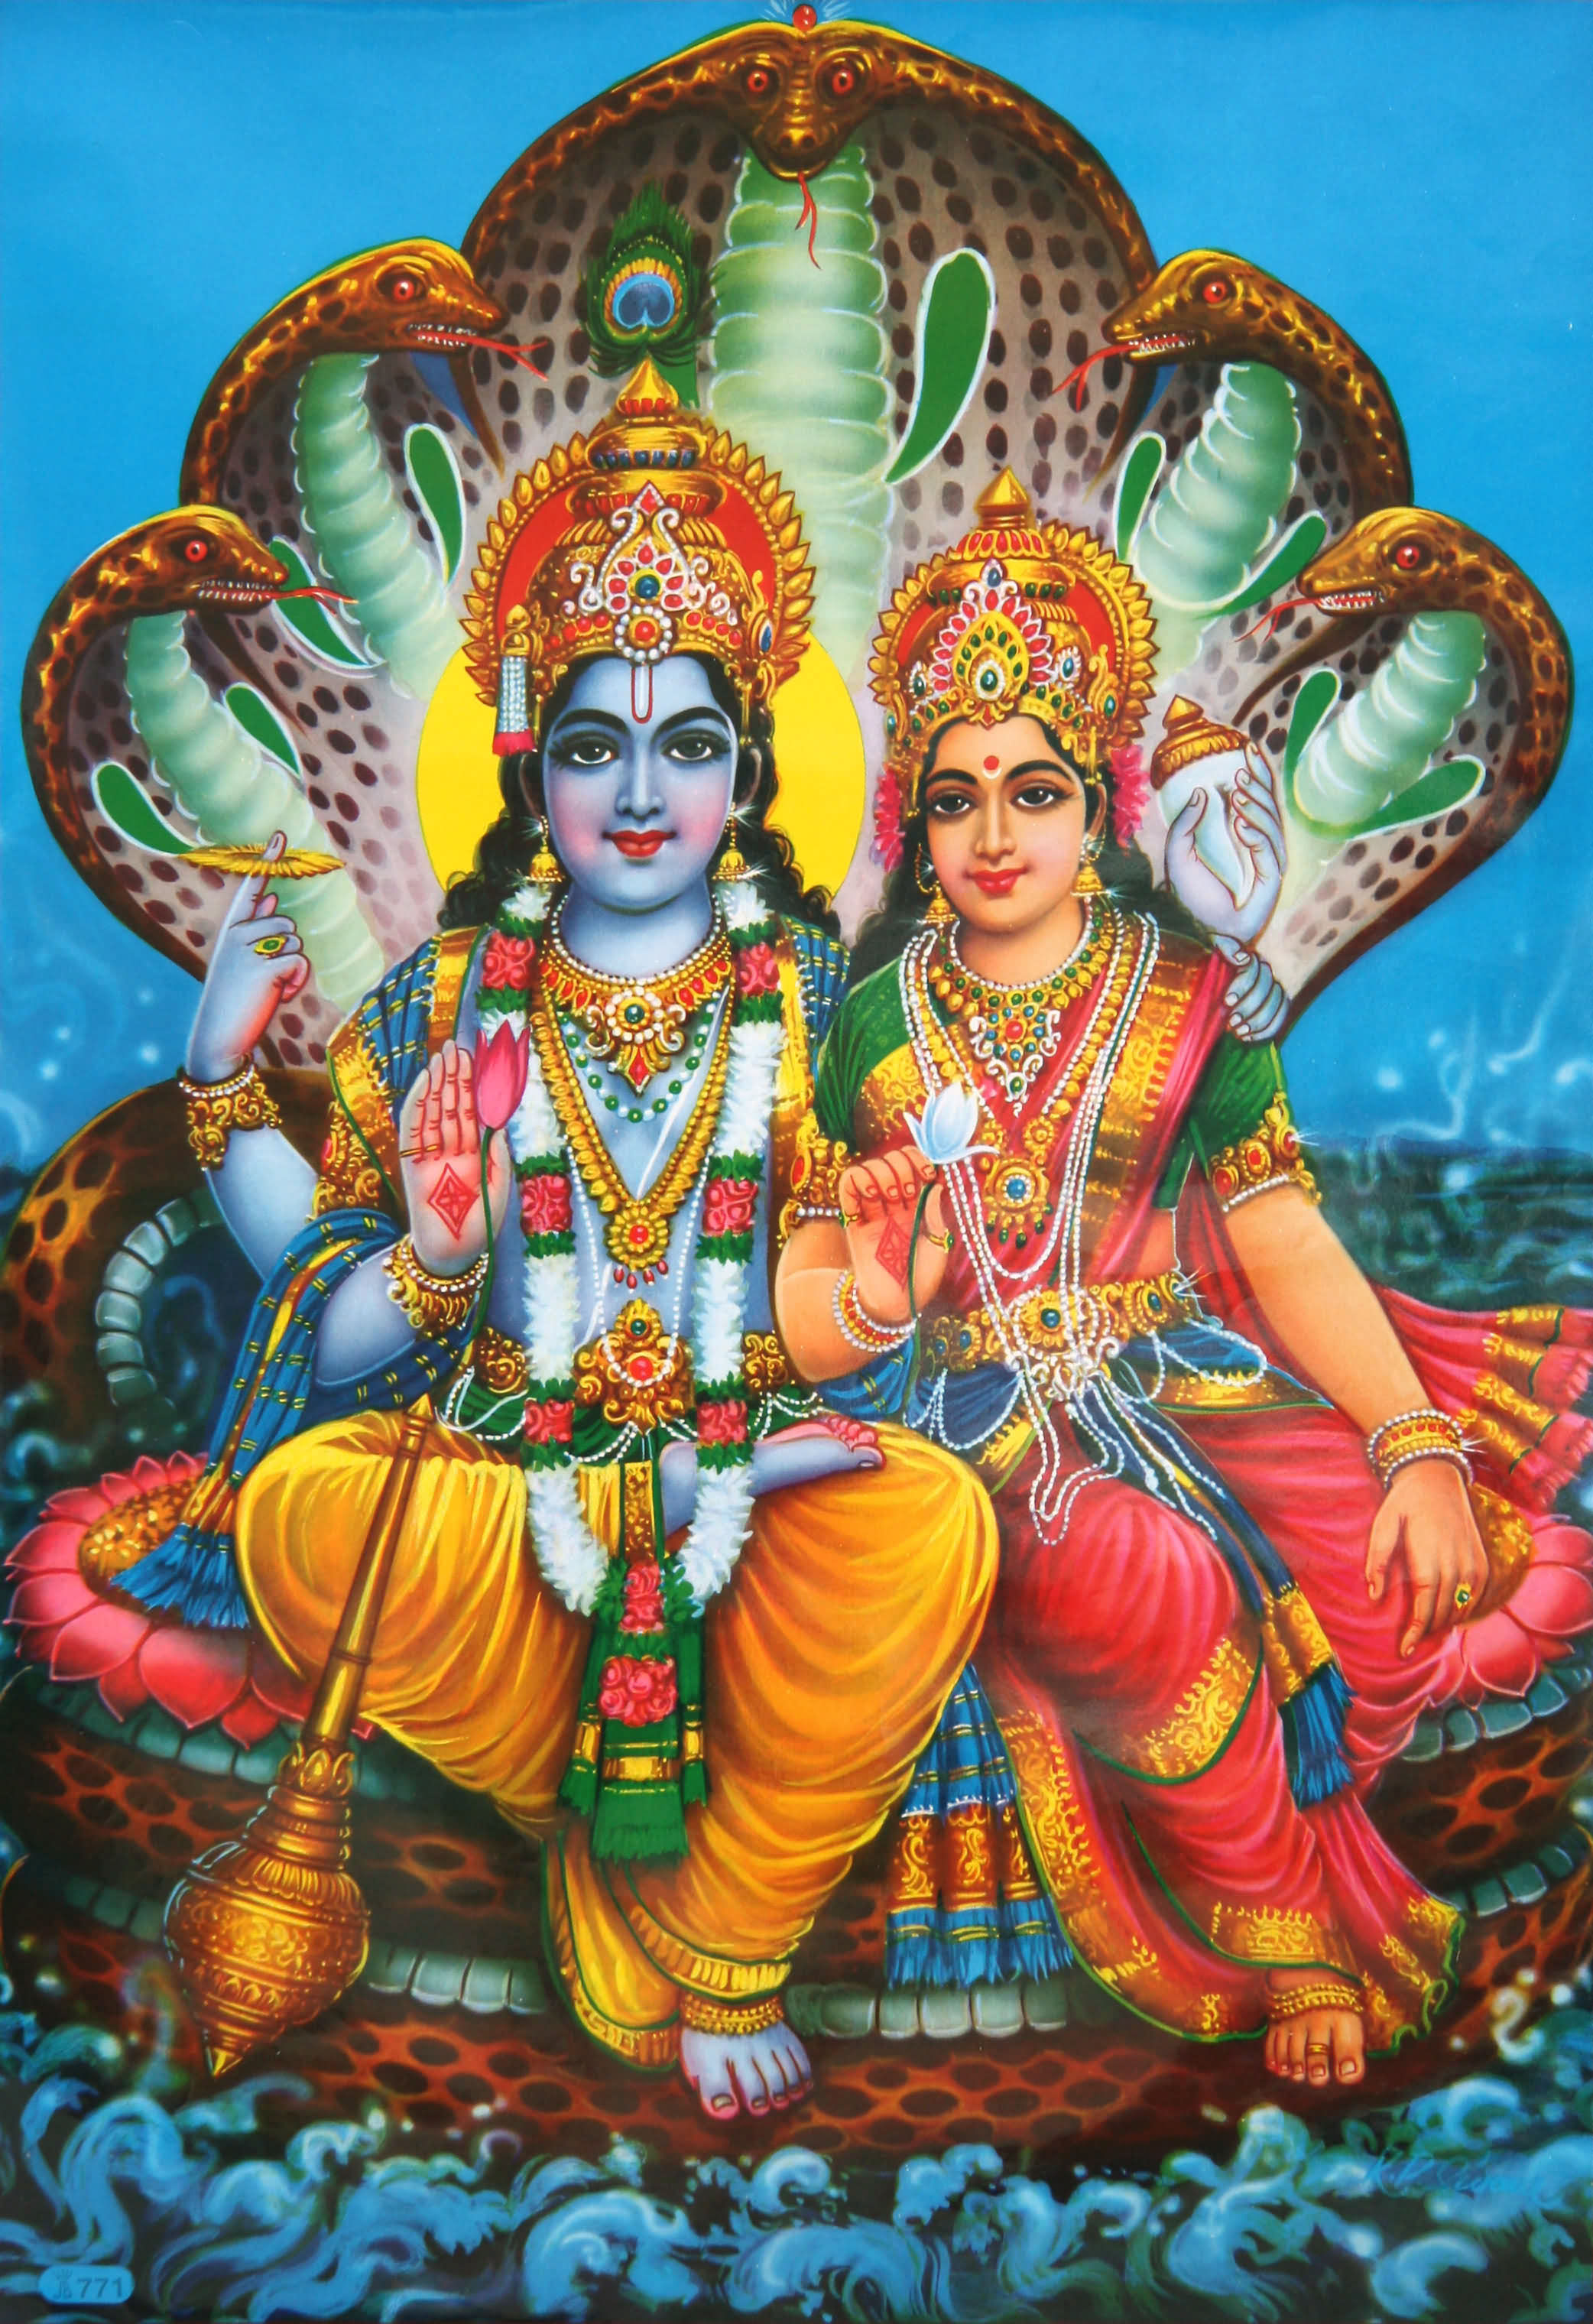 PunjabKesari, अपरा एकादशी व्रत, Apara Ekadashi Vrat, Vishnu lakshmi, विष्णु जी, देवी लक्ष्मी